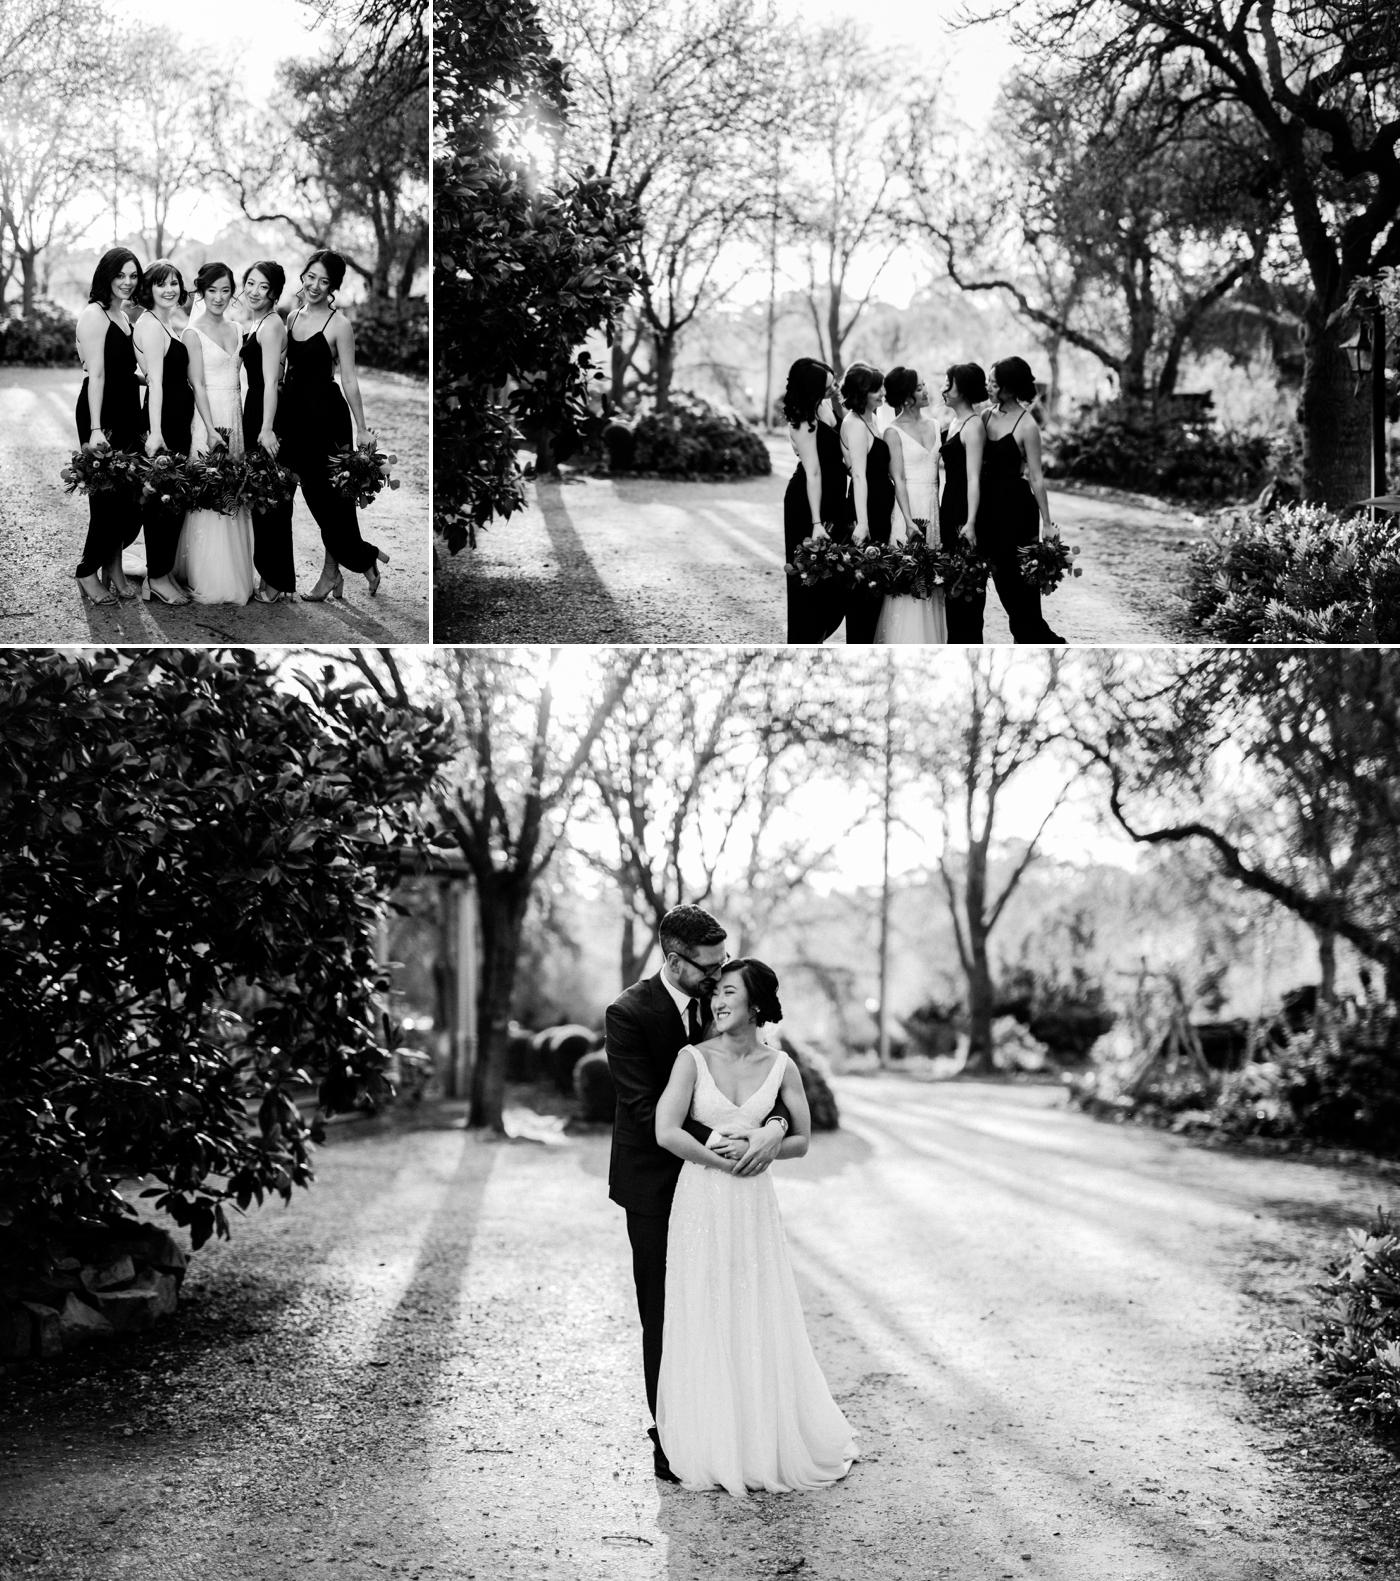 Adelaide Wedding Photographer - Al Ru Farm Wedding in Adelaide - Natural Wedding Photography Australia - www.katherineschultzphotography.com - Todd & Rachel_0047.jpg